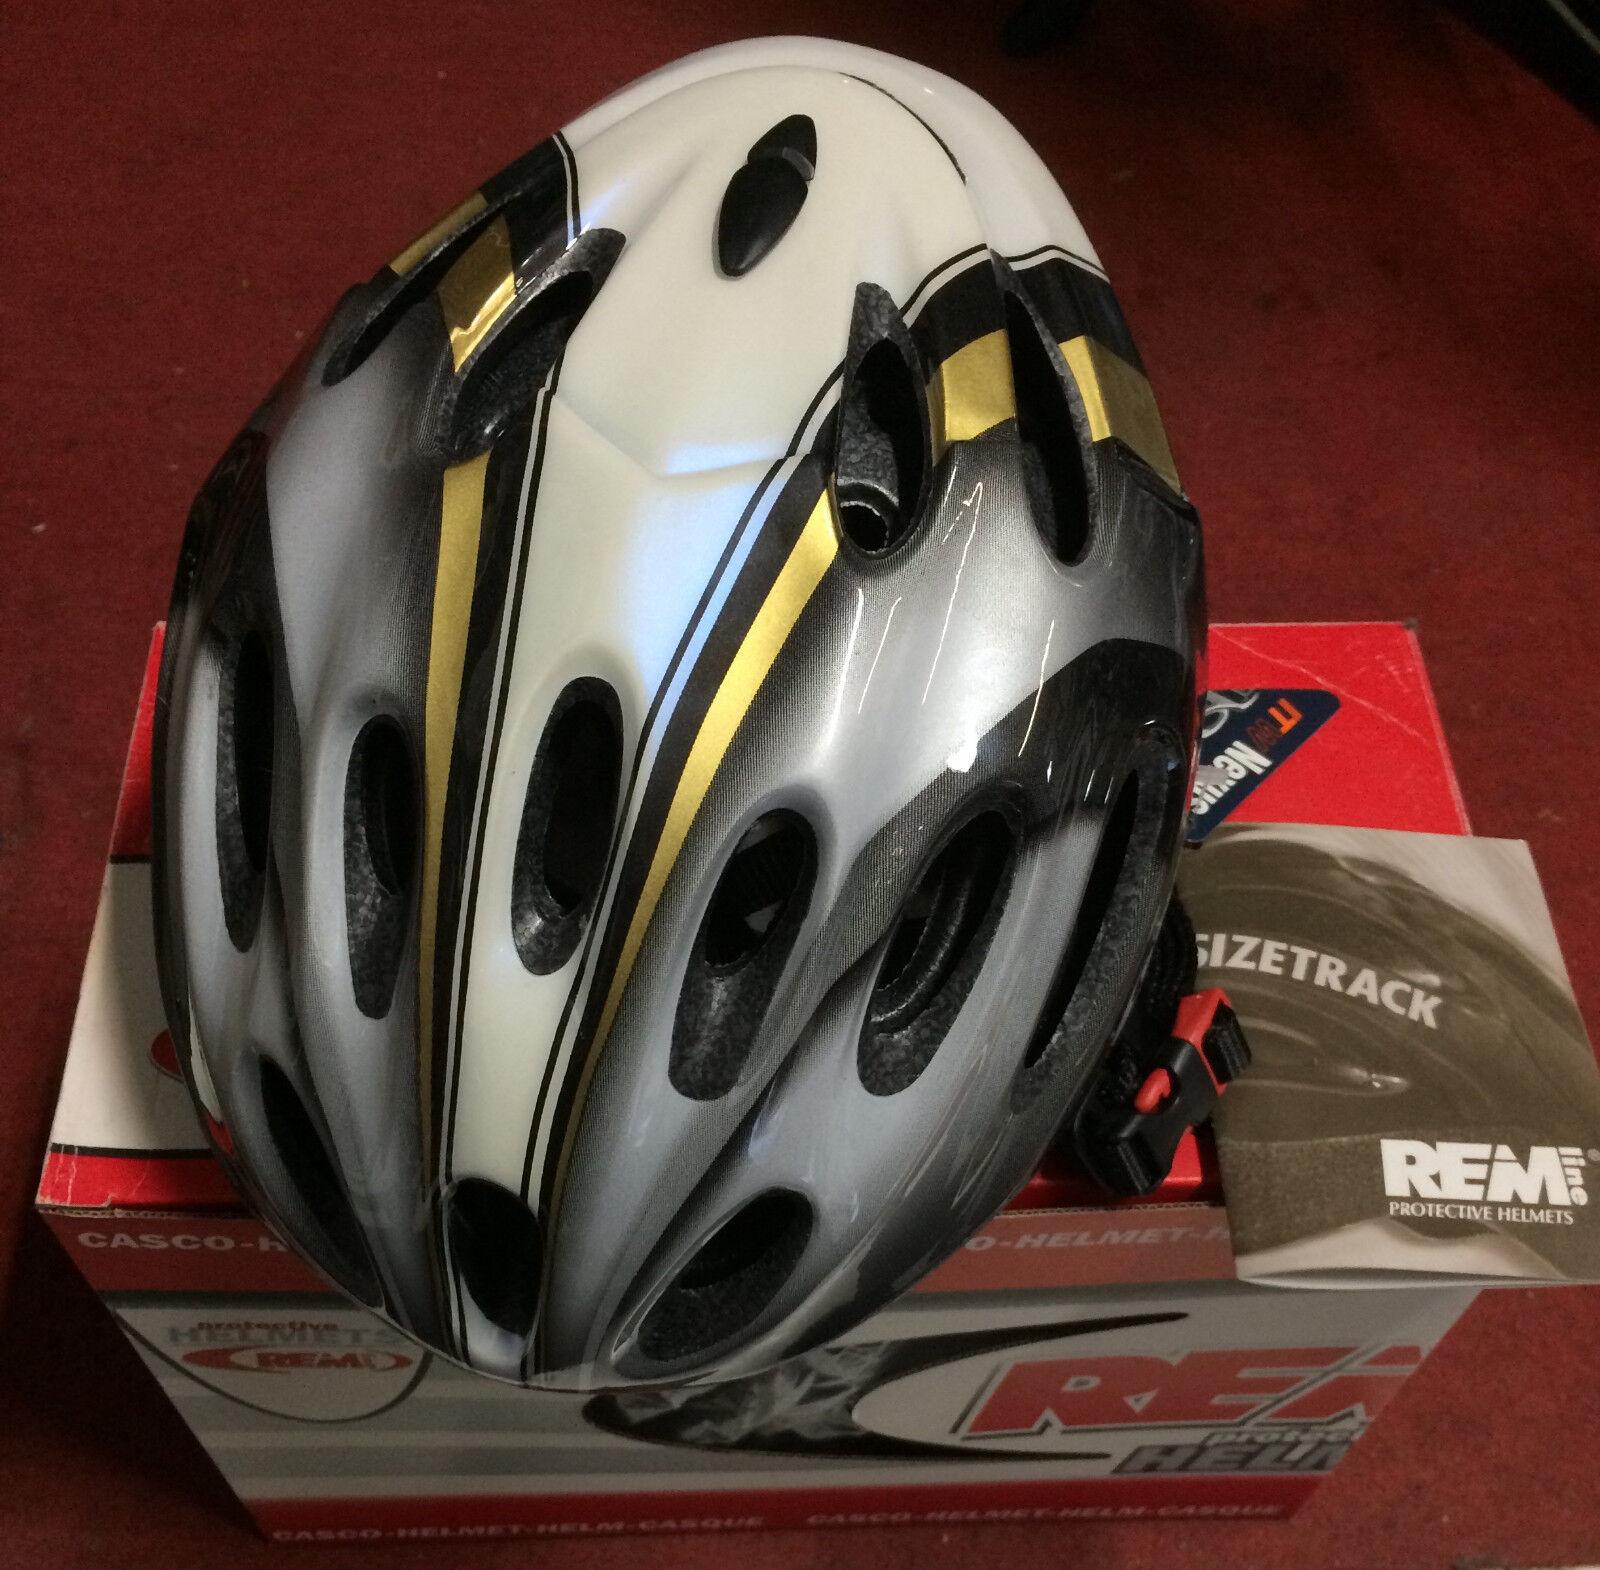 Casco bici corsa Rem Line  R3200 gold road bike helmet Unisize 54-61 cm gold black  the latest